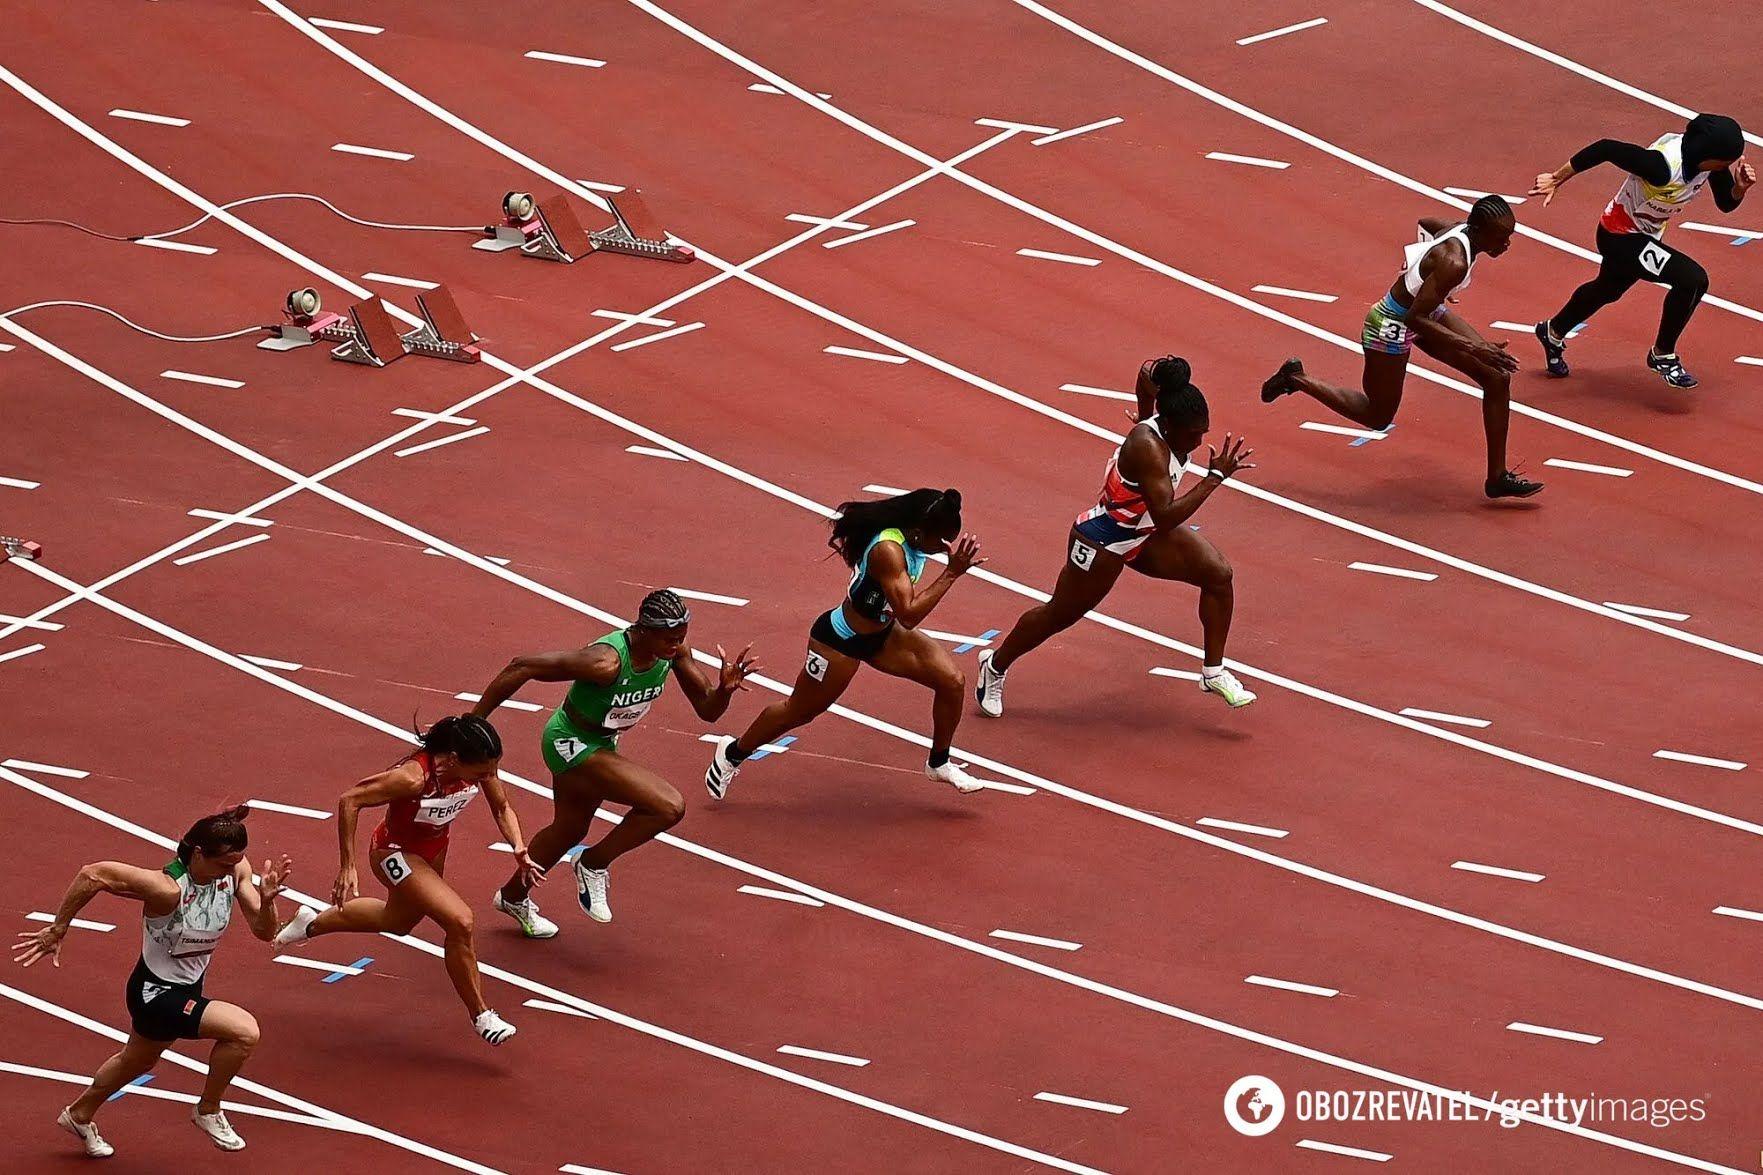 Забег на Олимпиаде